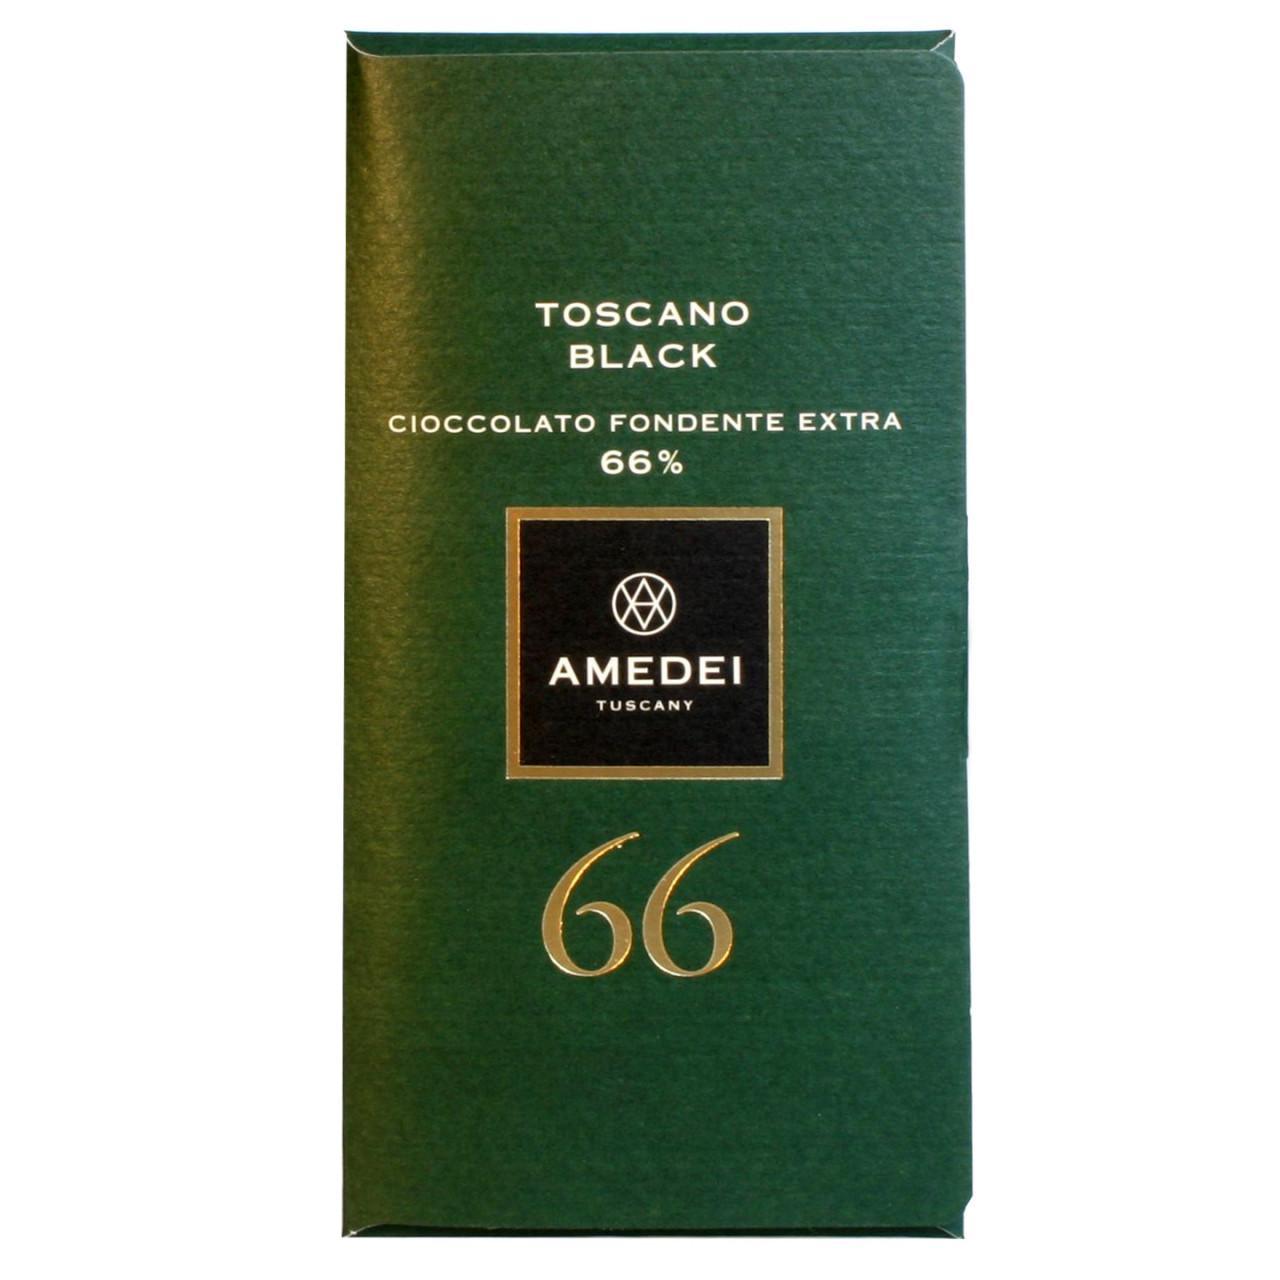 dark chocolate chocolat noir Tuscany Italy lezithinfrei lecithinfrei glutenfrei glutenfree                                                                                                               - Tablette de chocolat, Italie, chocolat italien, Chocolat avec sucre - Chocolats-De-Luxe